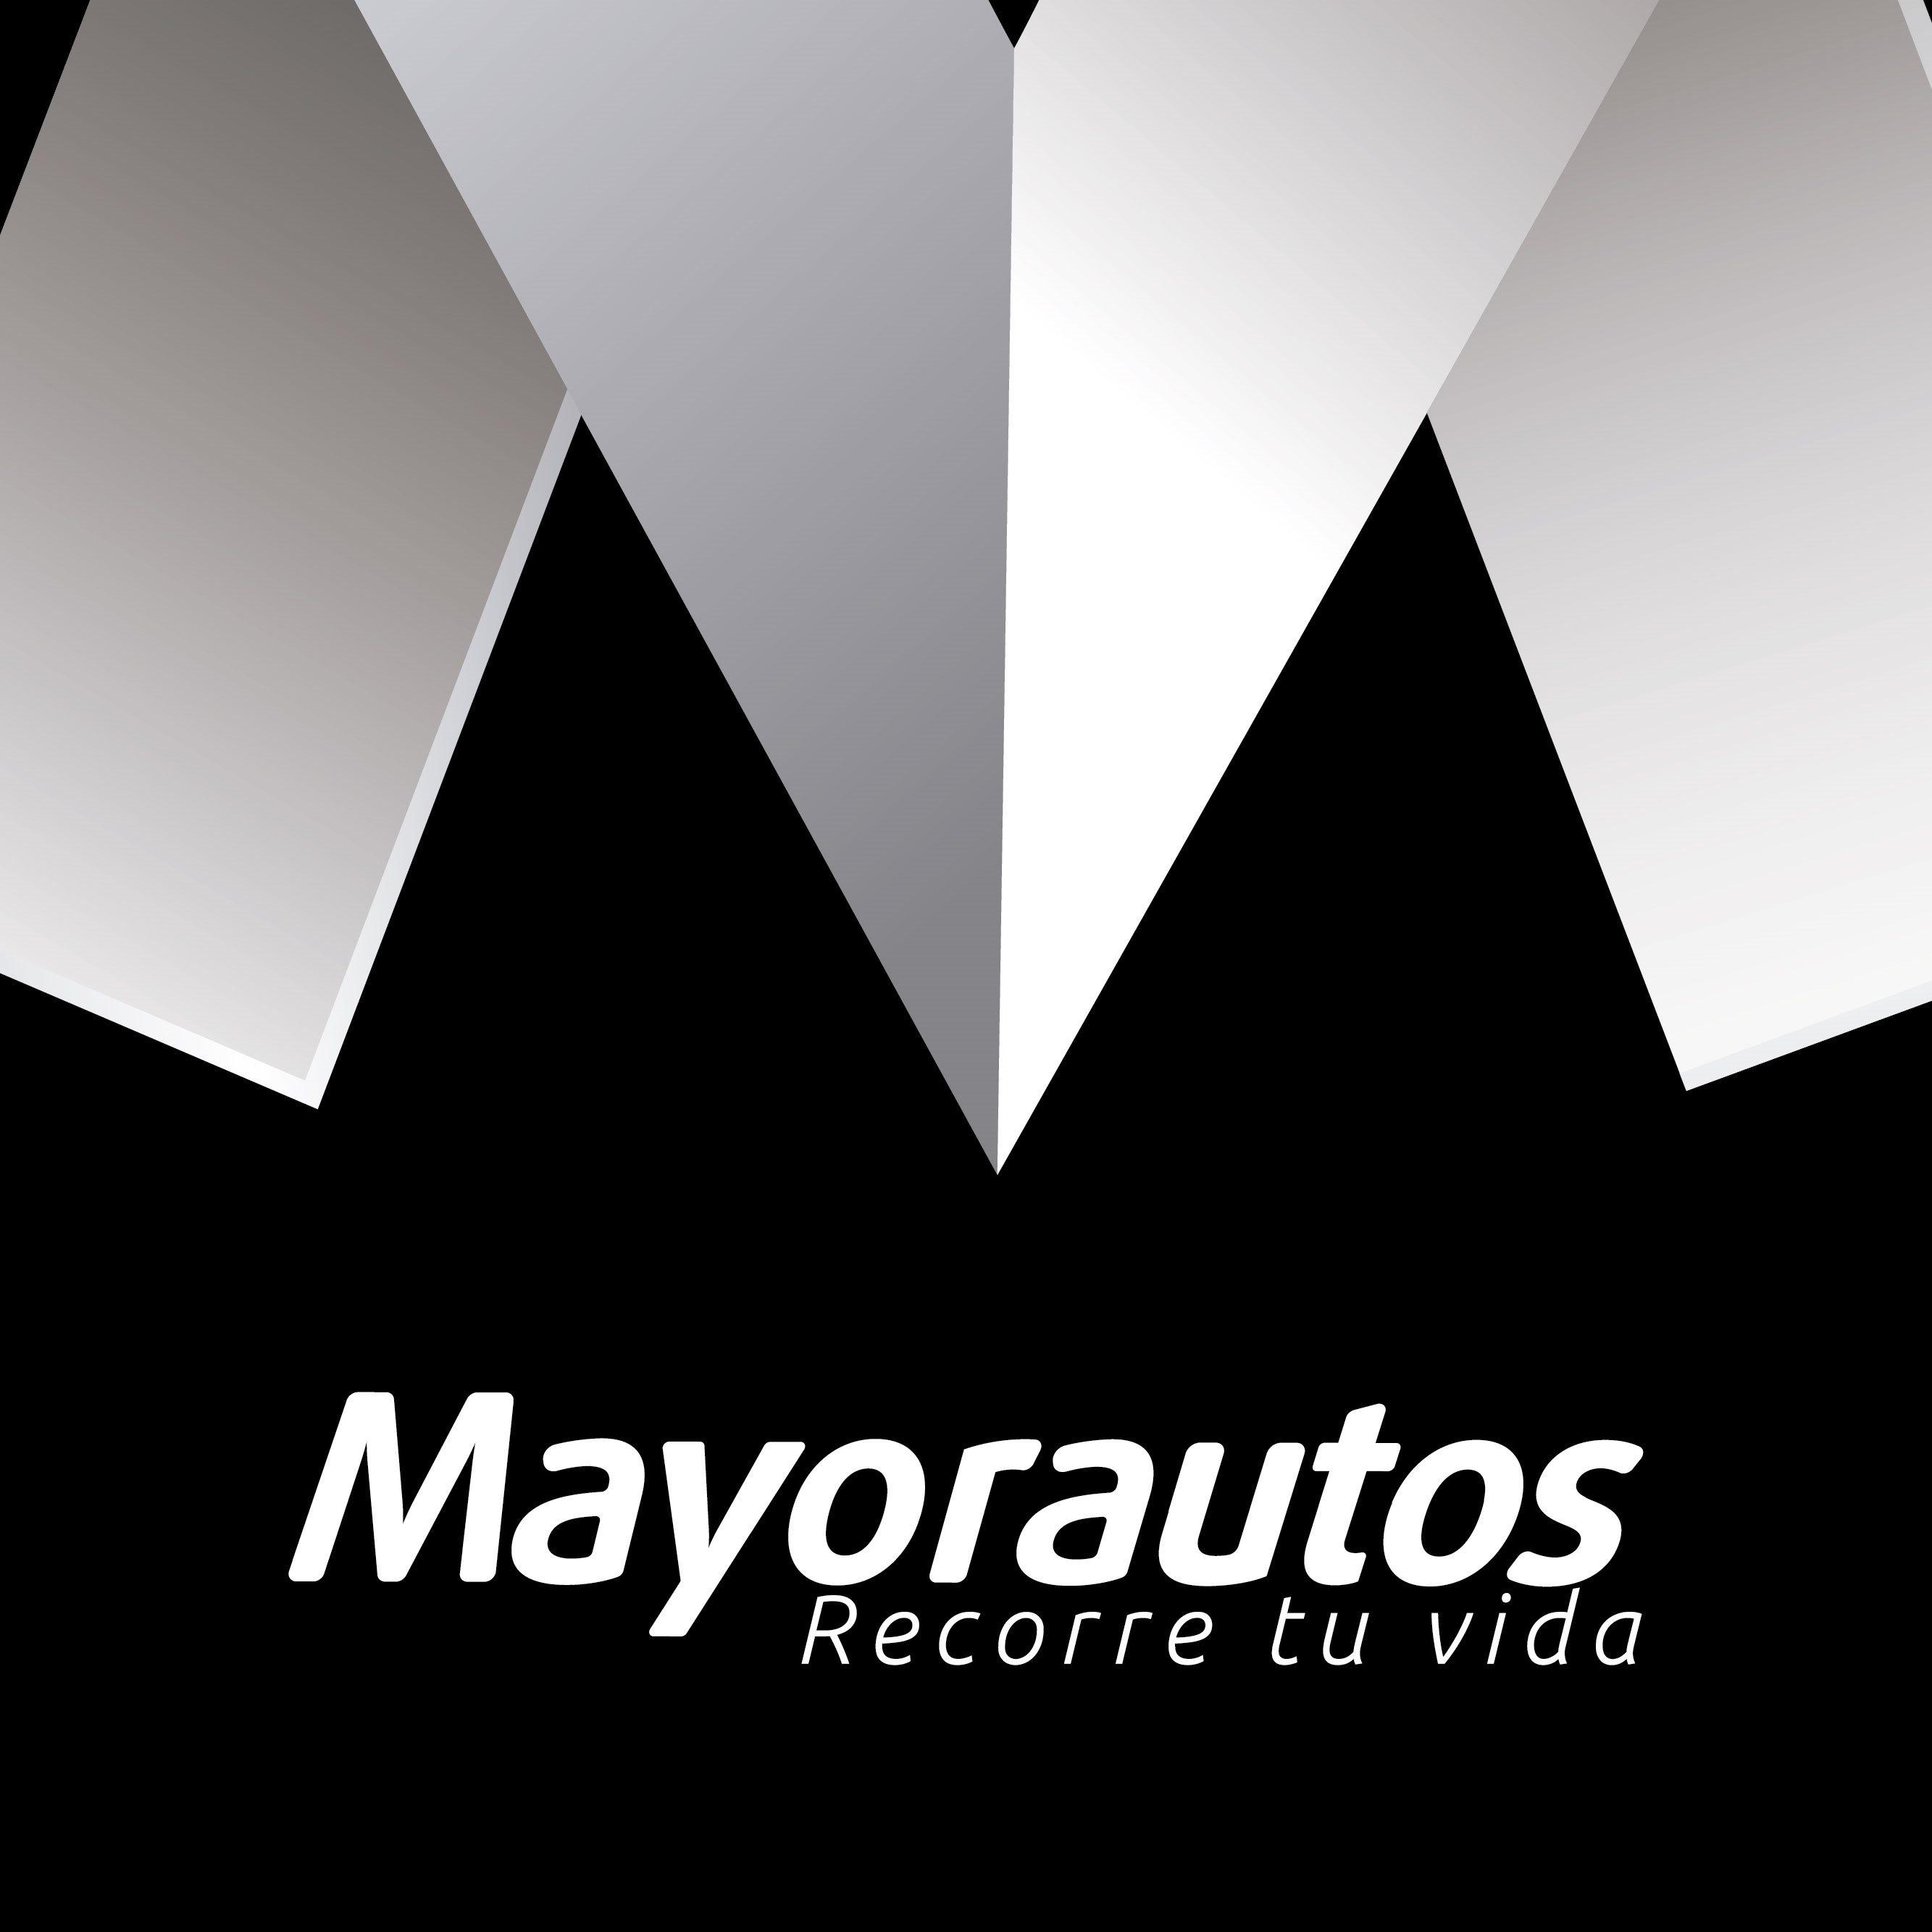 MAYORAUTOS S.A.S.